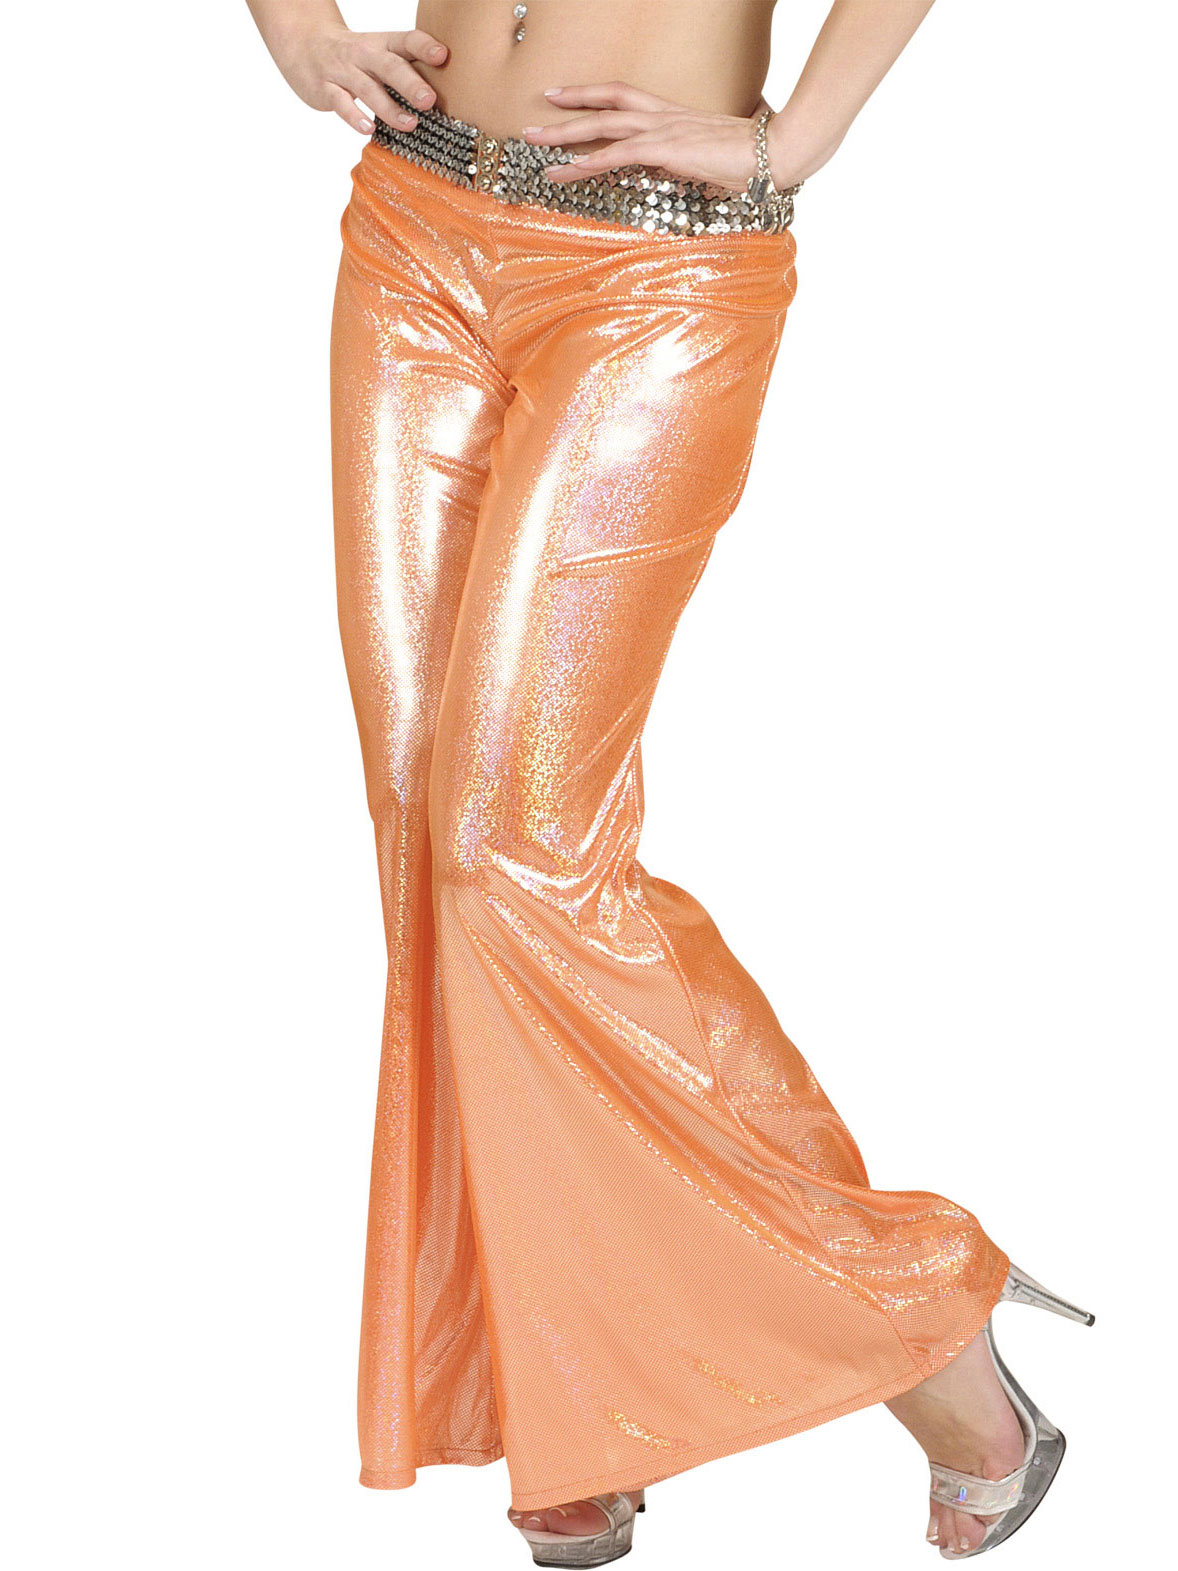 7fc6239e Holografiske disko-bukser orange dame, køb Kostumer til voksne på Vegaoo.dk